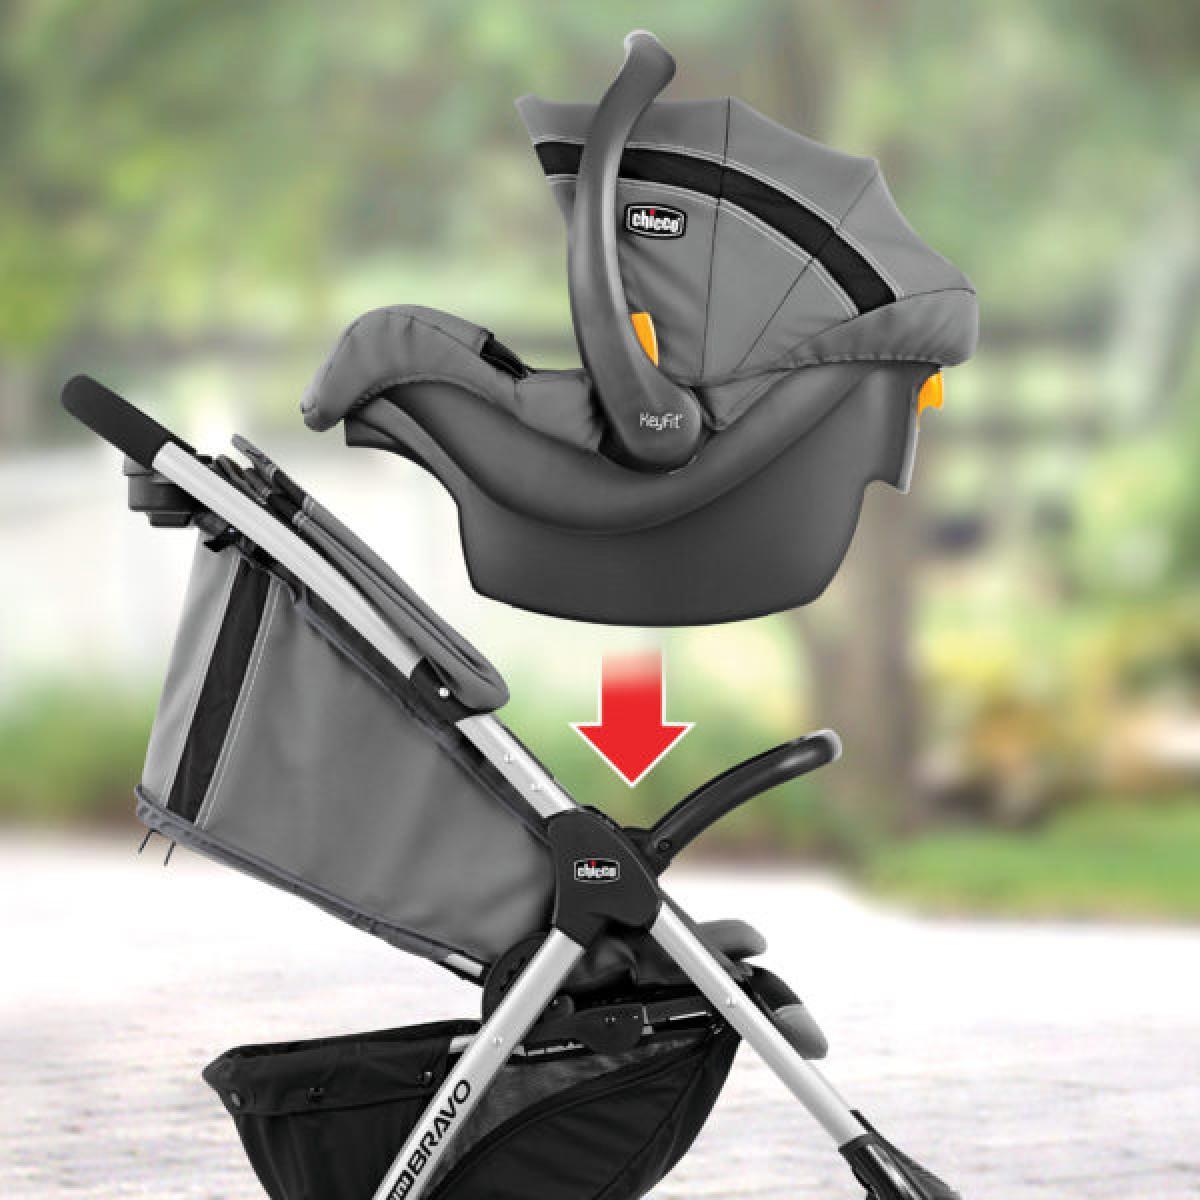 Chicco Mini Bravo Plus Travel System (Stroller + Carrier)